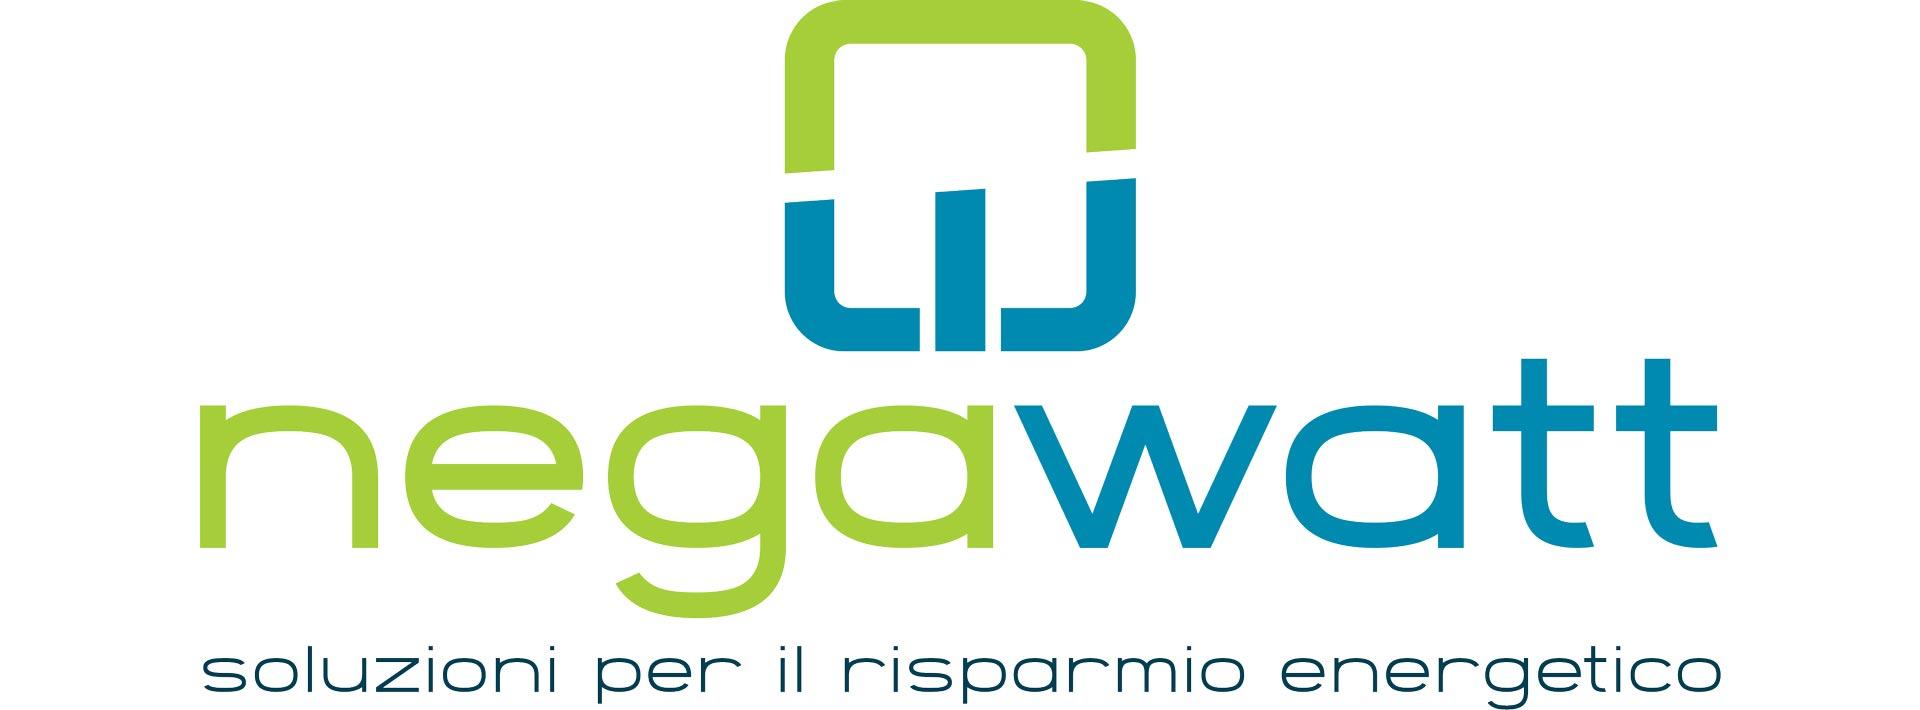 negawatt-progettazione-logo-verticale